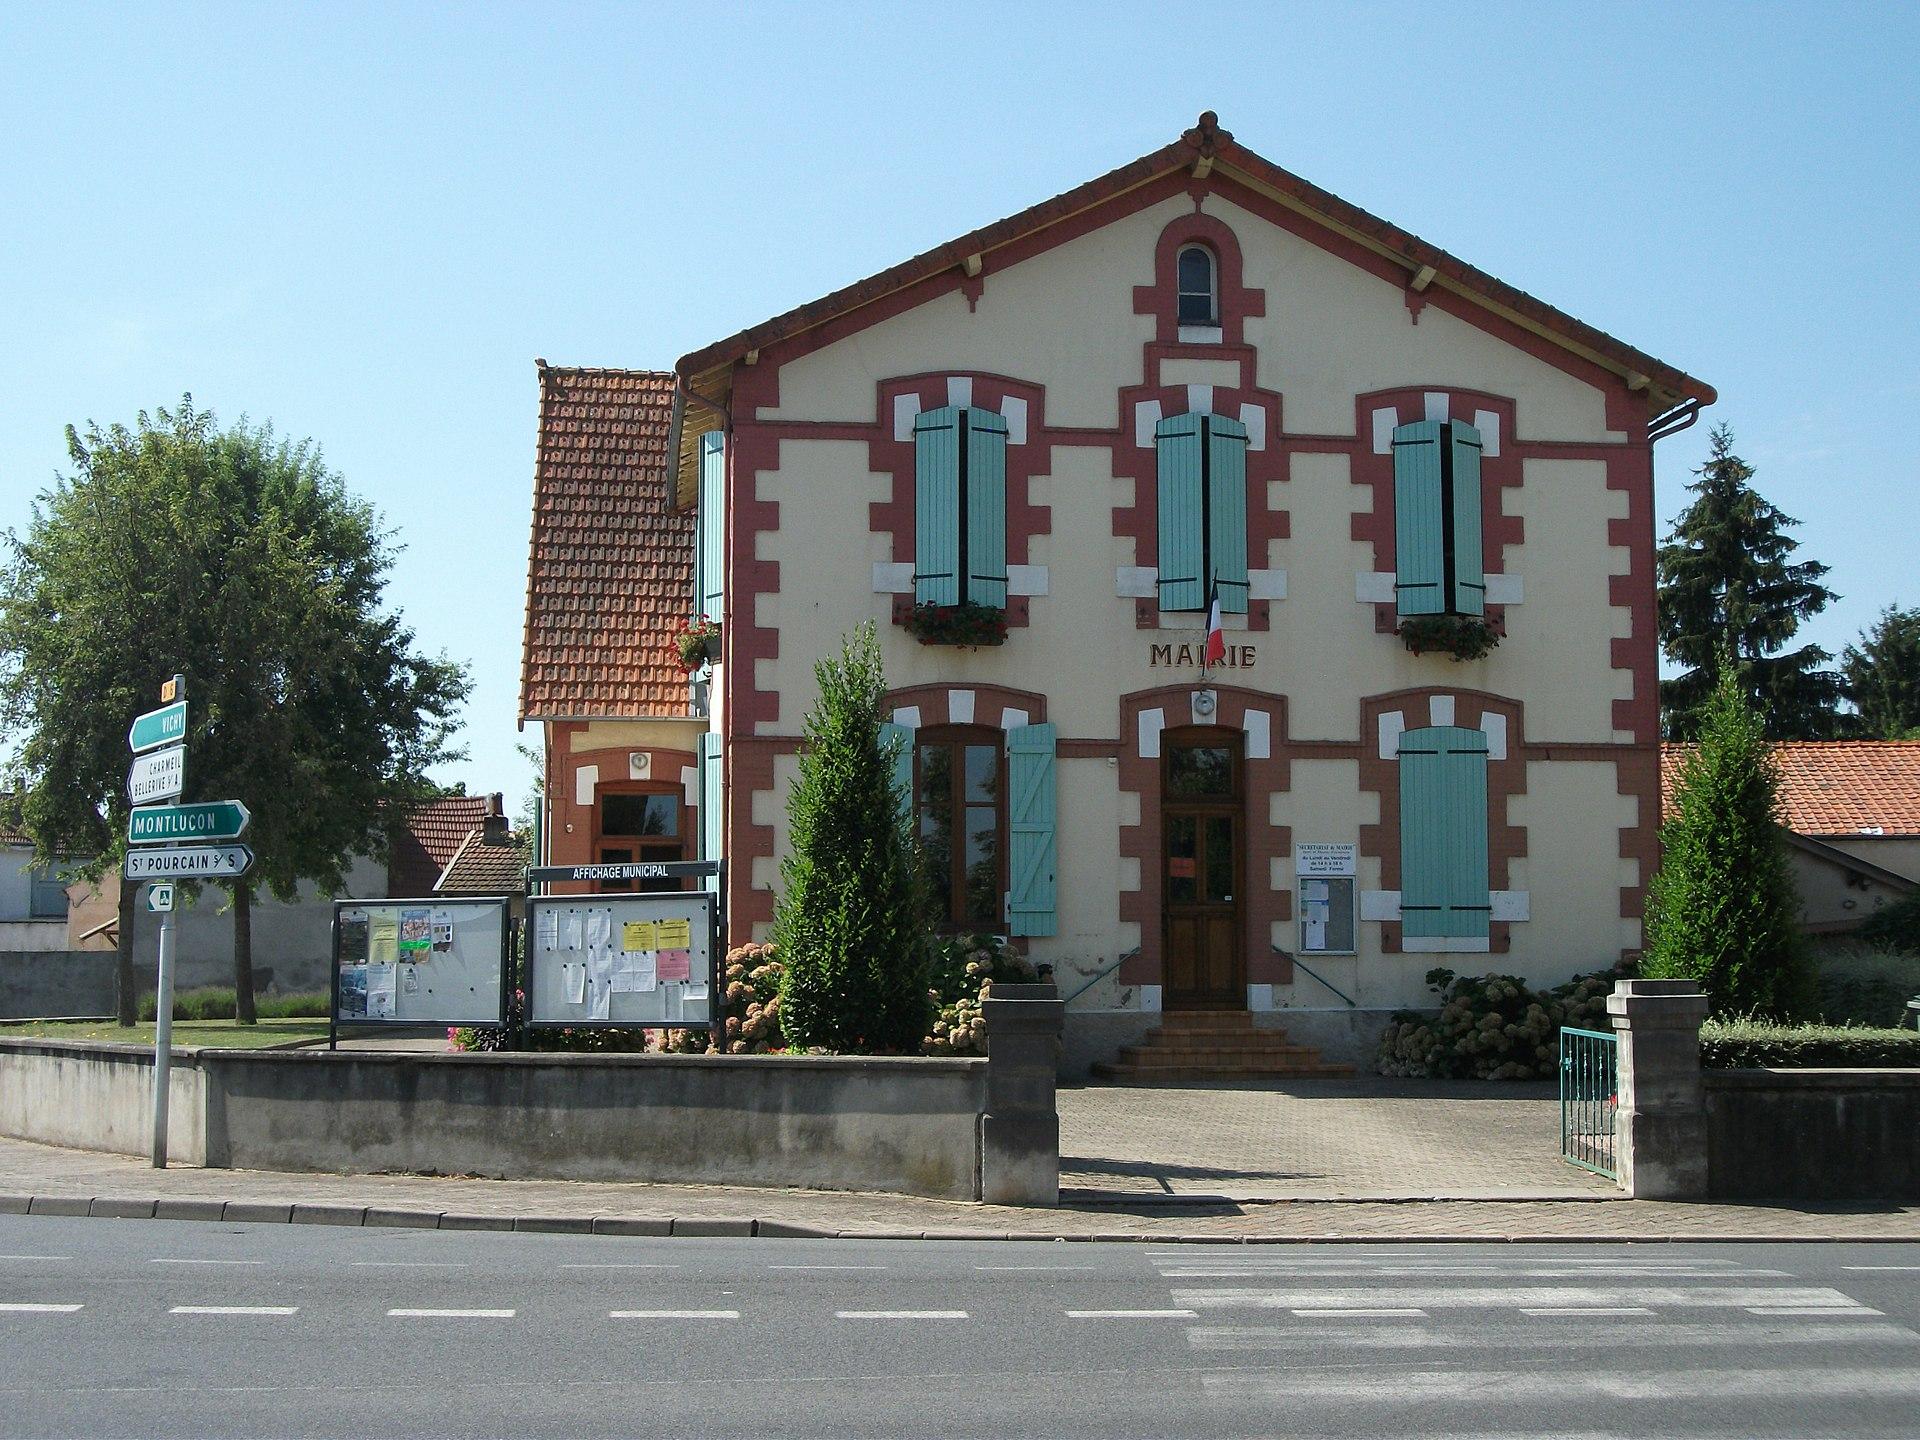 Restaurant Saint R Ef Bf Bdmy De Provence Site Webitin Ef Bf Bdraire